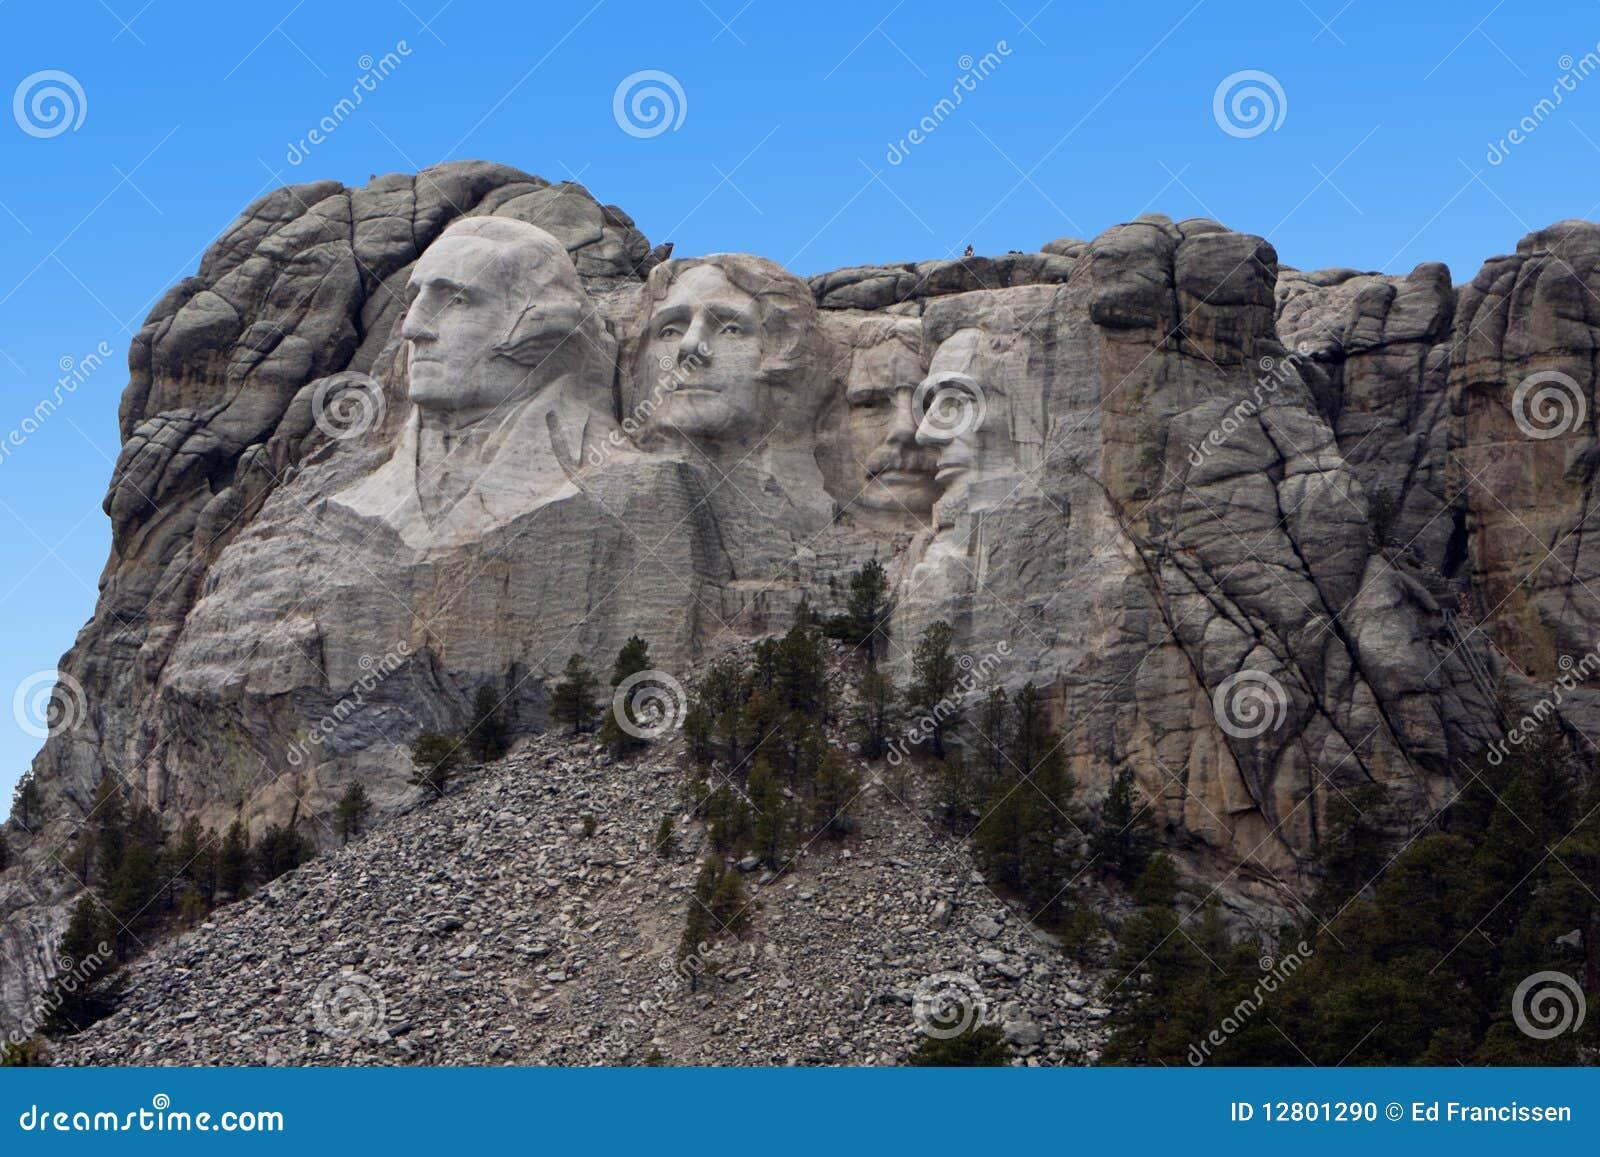 Mount rushmore stock photo image